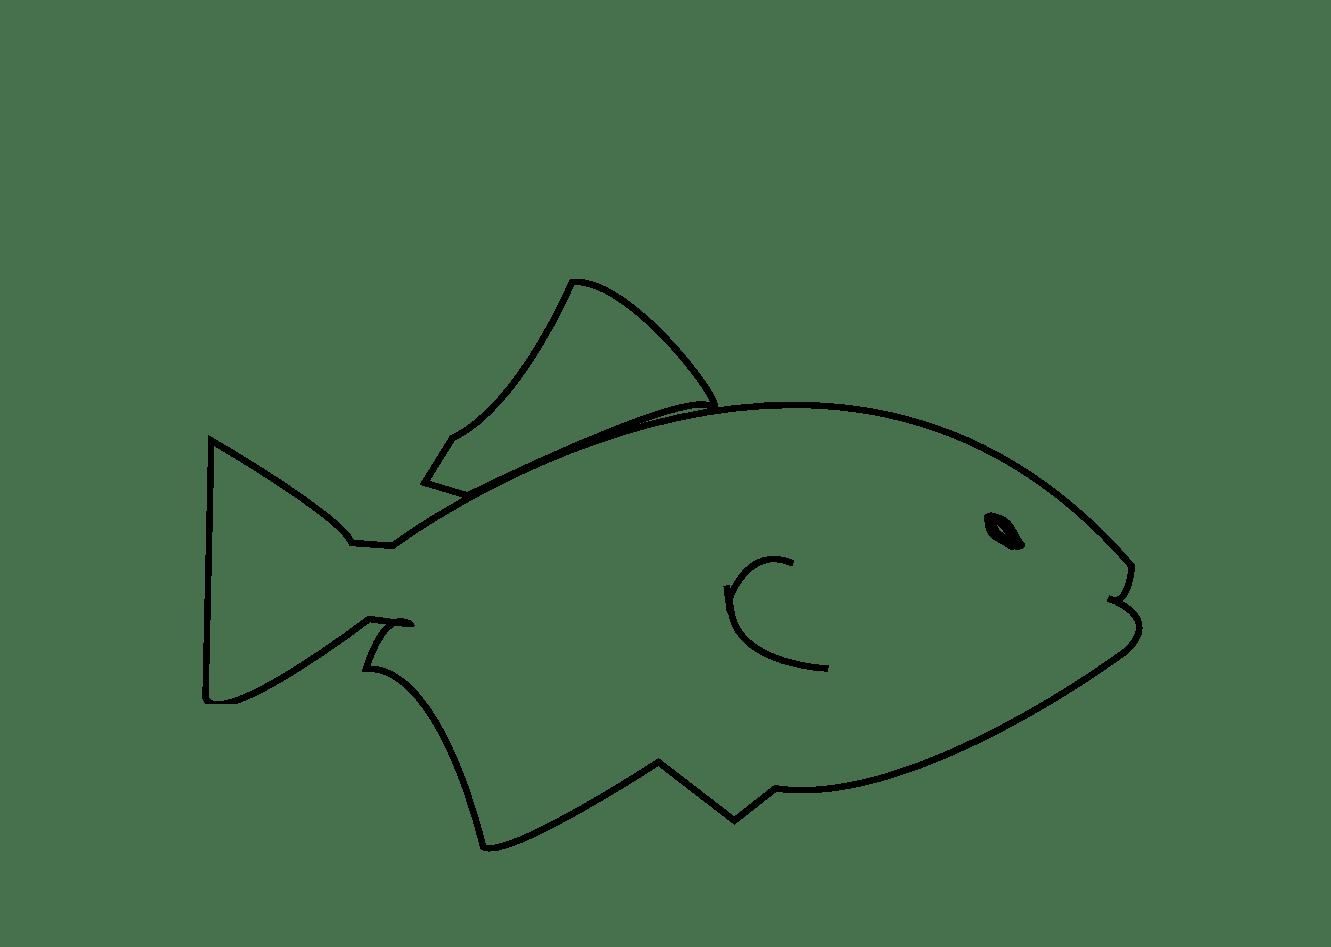 hight resolution of free fish clip art school clipart